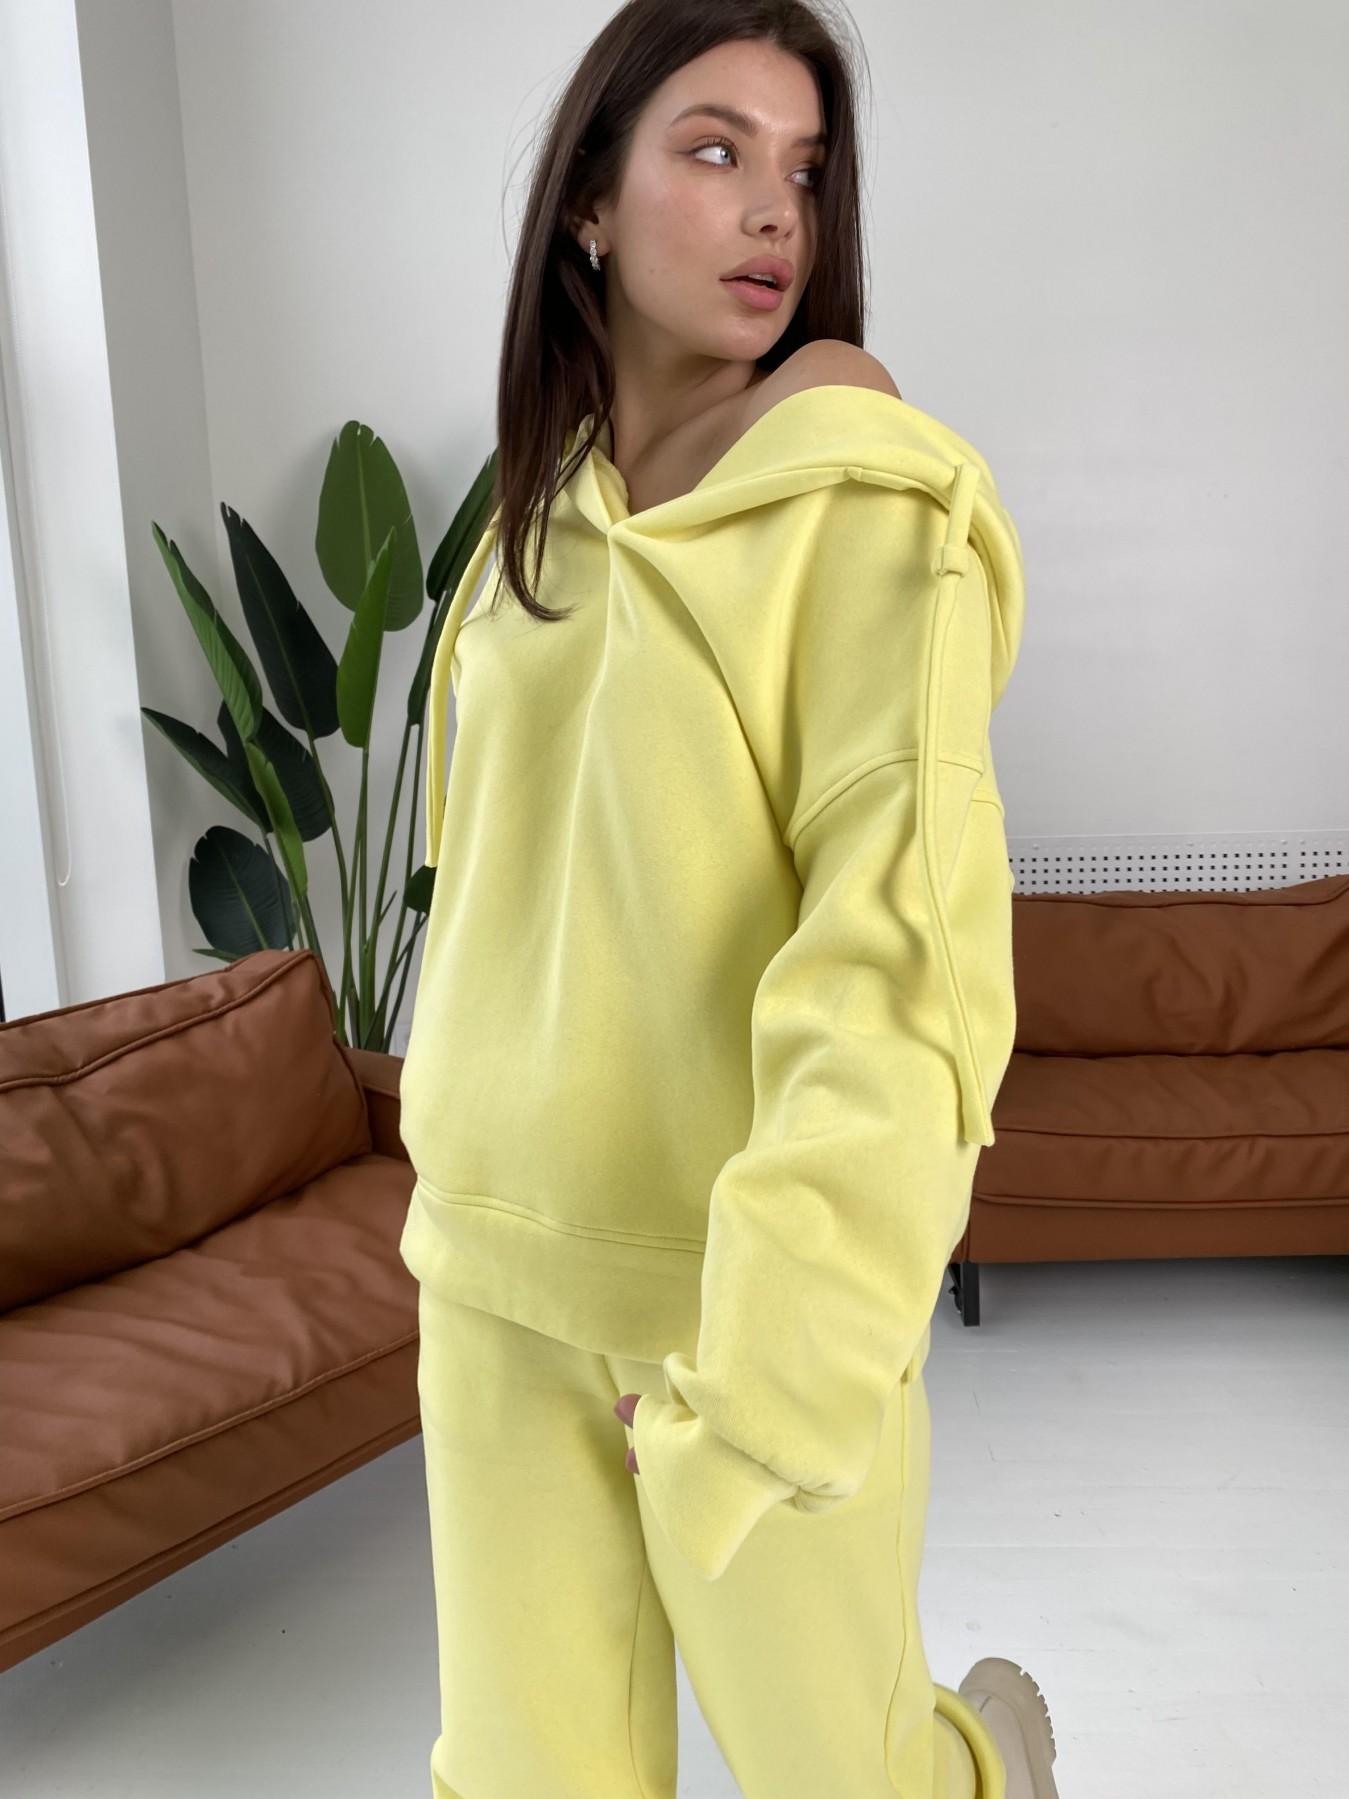 Ярис костюм из 3х нитки 10789 АРТ. 47259 Цвет: Лимон - фото 1, интернет магазин tm-modus.ru